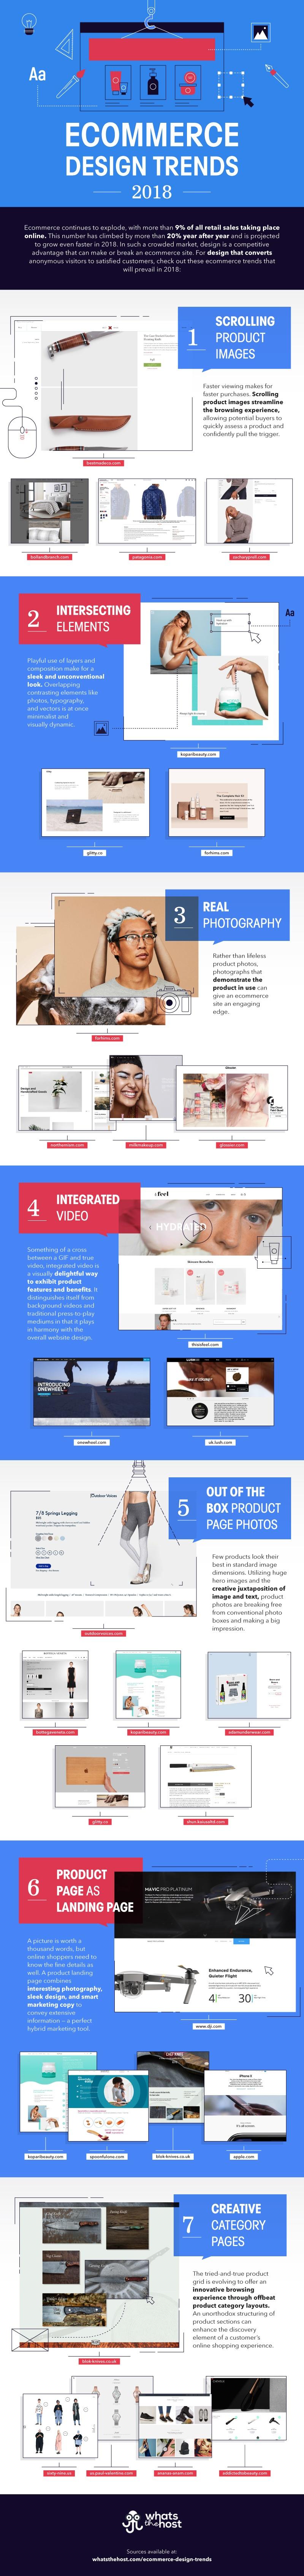 ecommerce-design-trends-2018-infographic